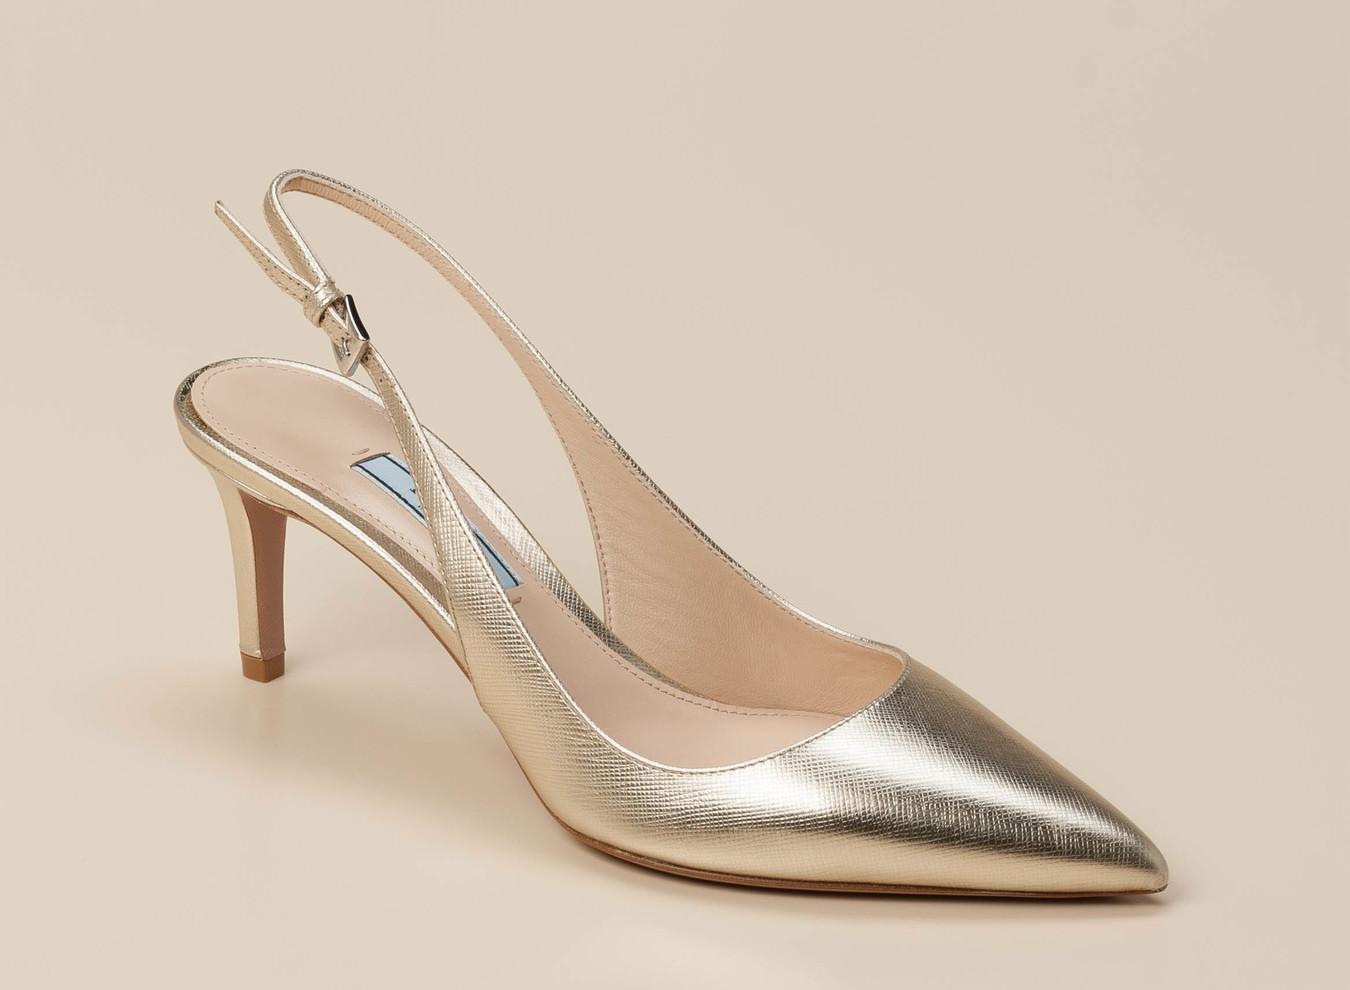 e79171d492463 Prada Damen Slingpumps in gold kaufen